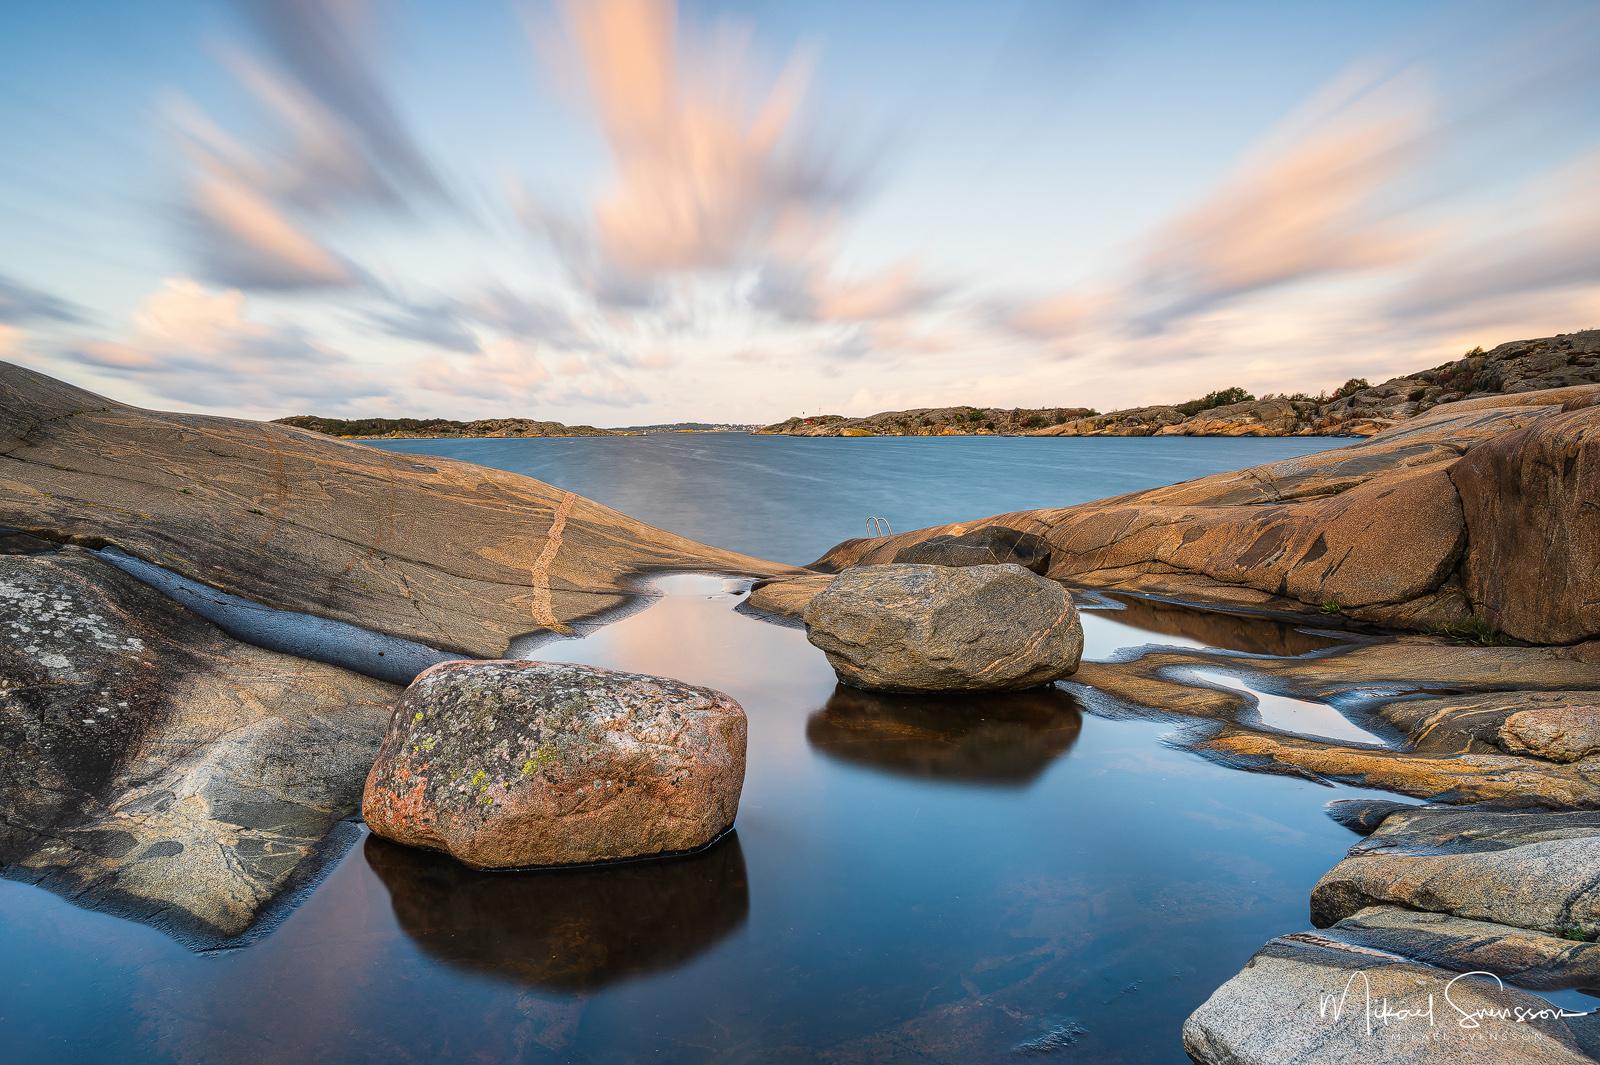 Smithska udden, Göteborg, Sweden.